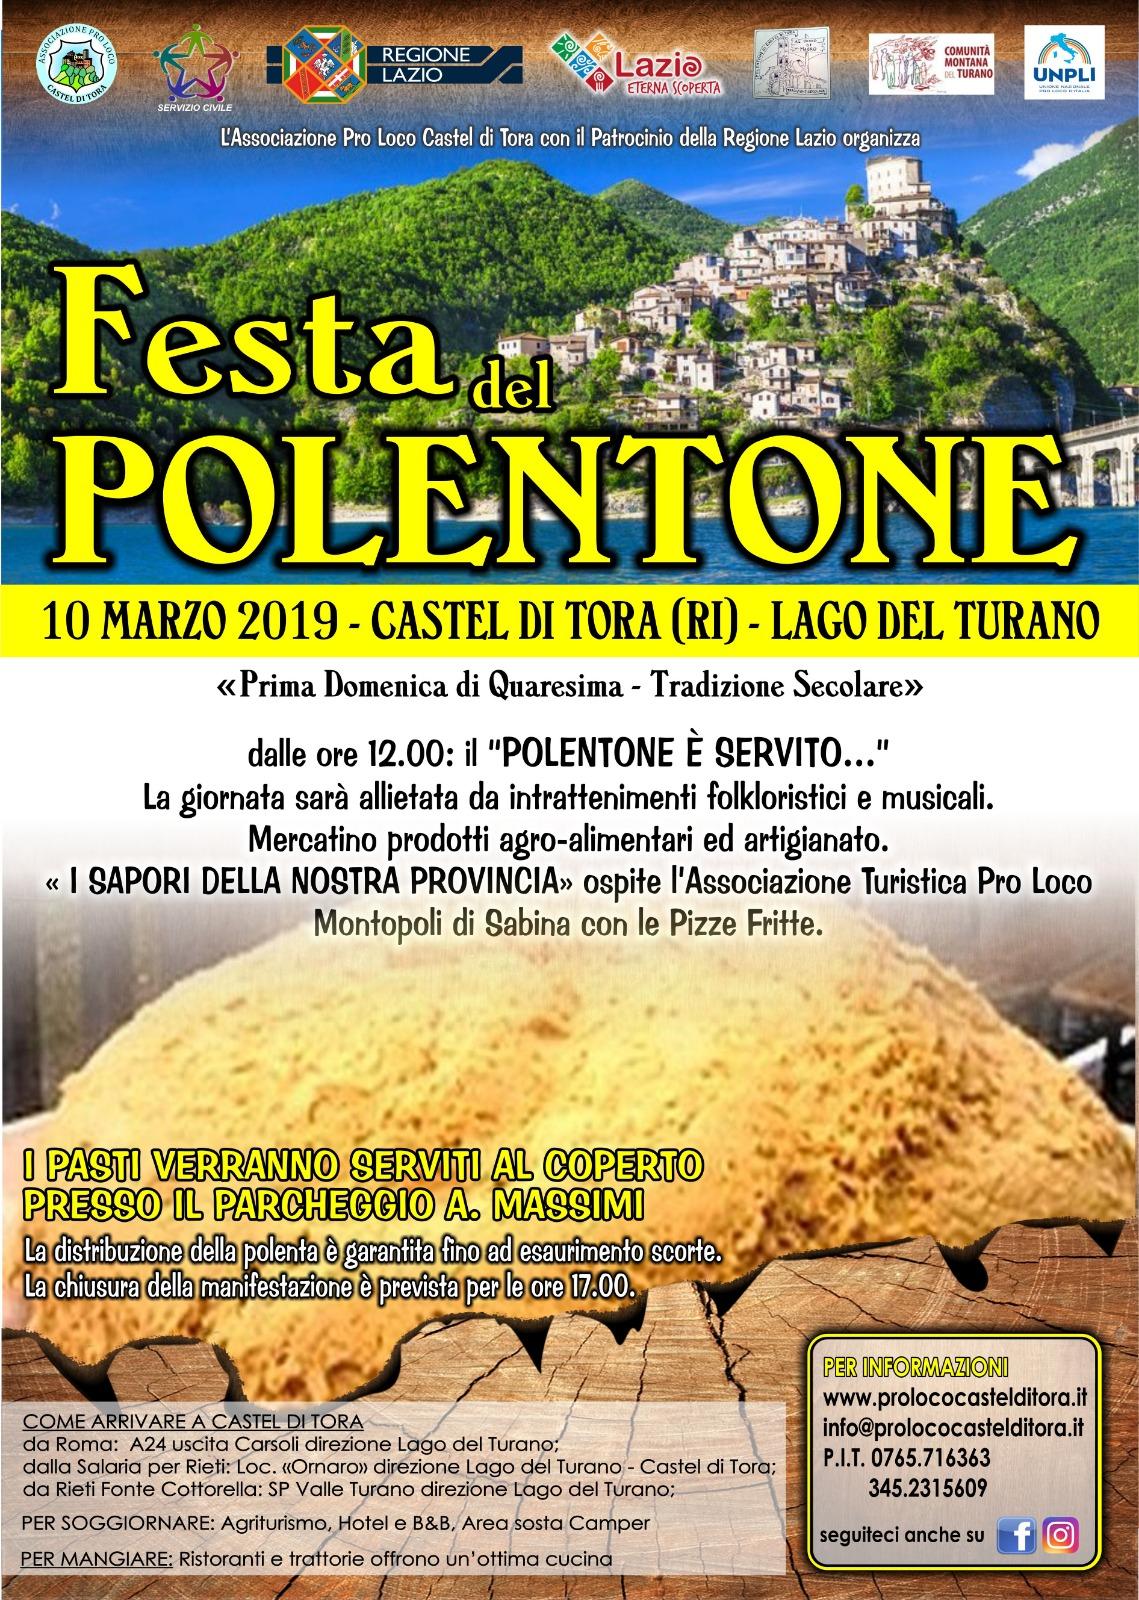 Polentone Castel di Tora